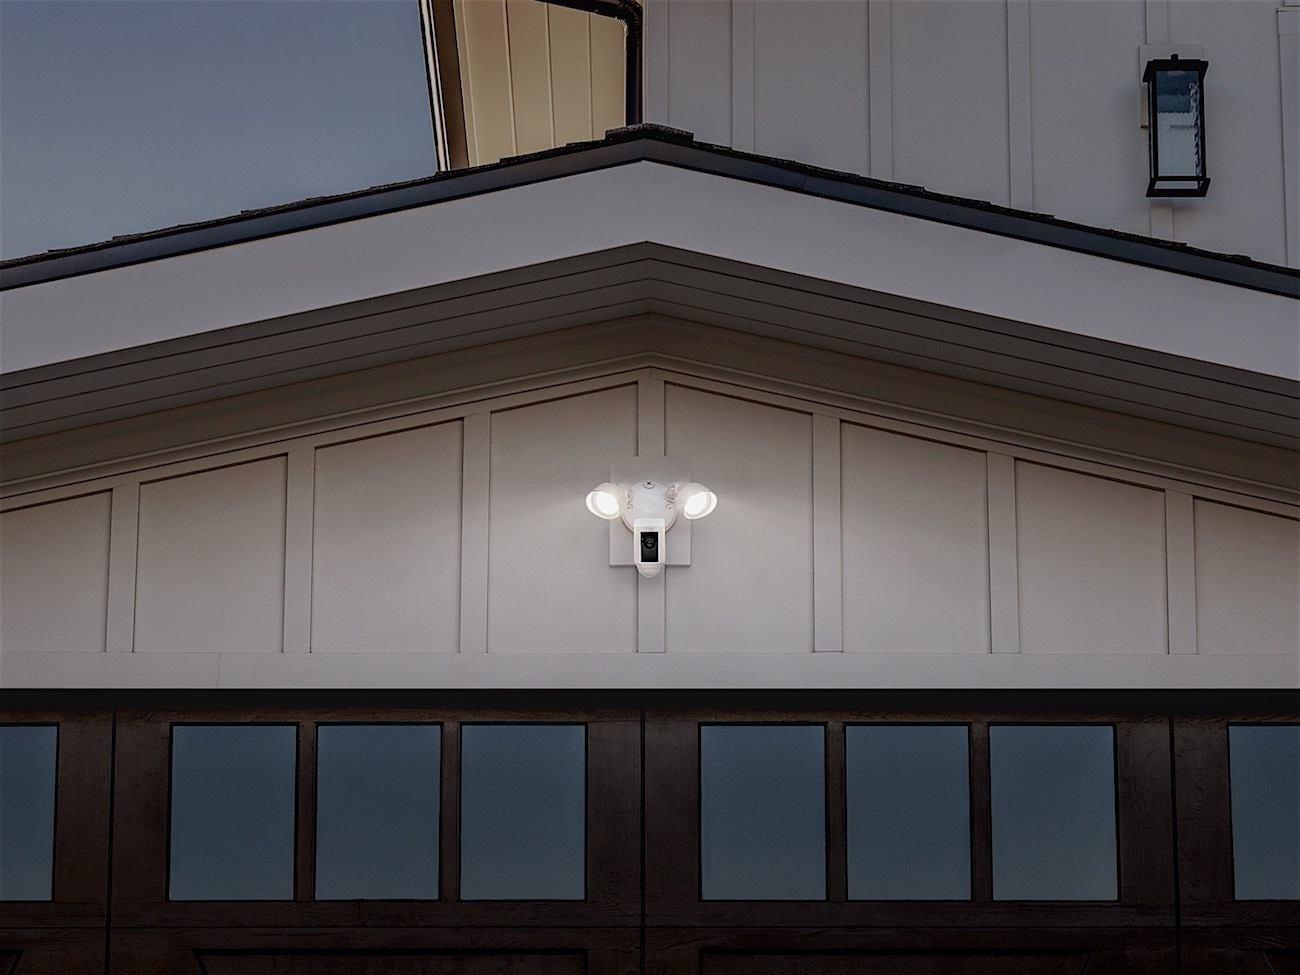 Ring Security Floodlight Camera » Gadget Flow